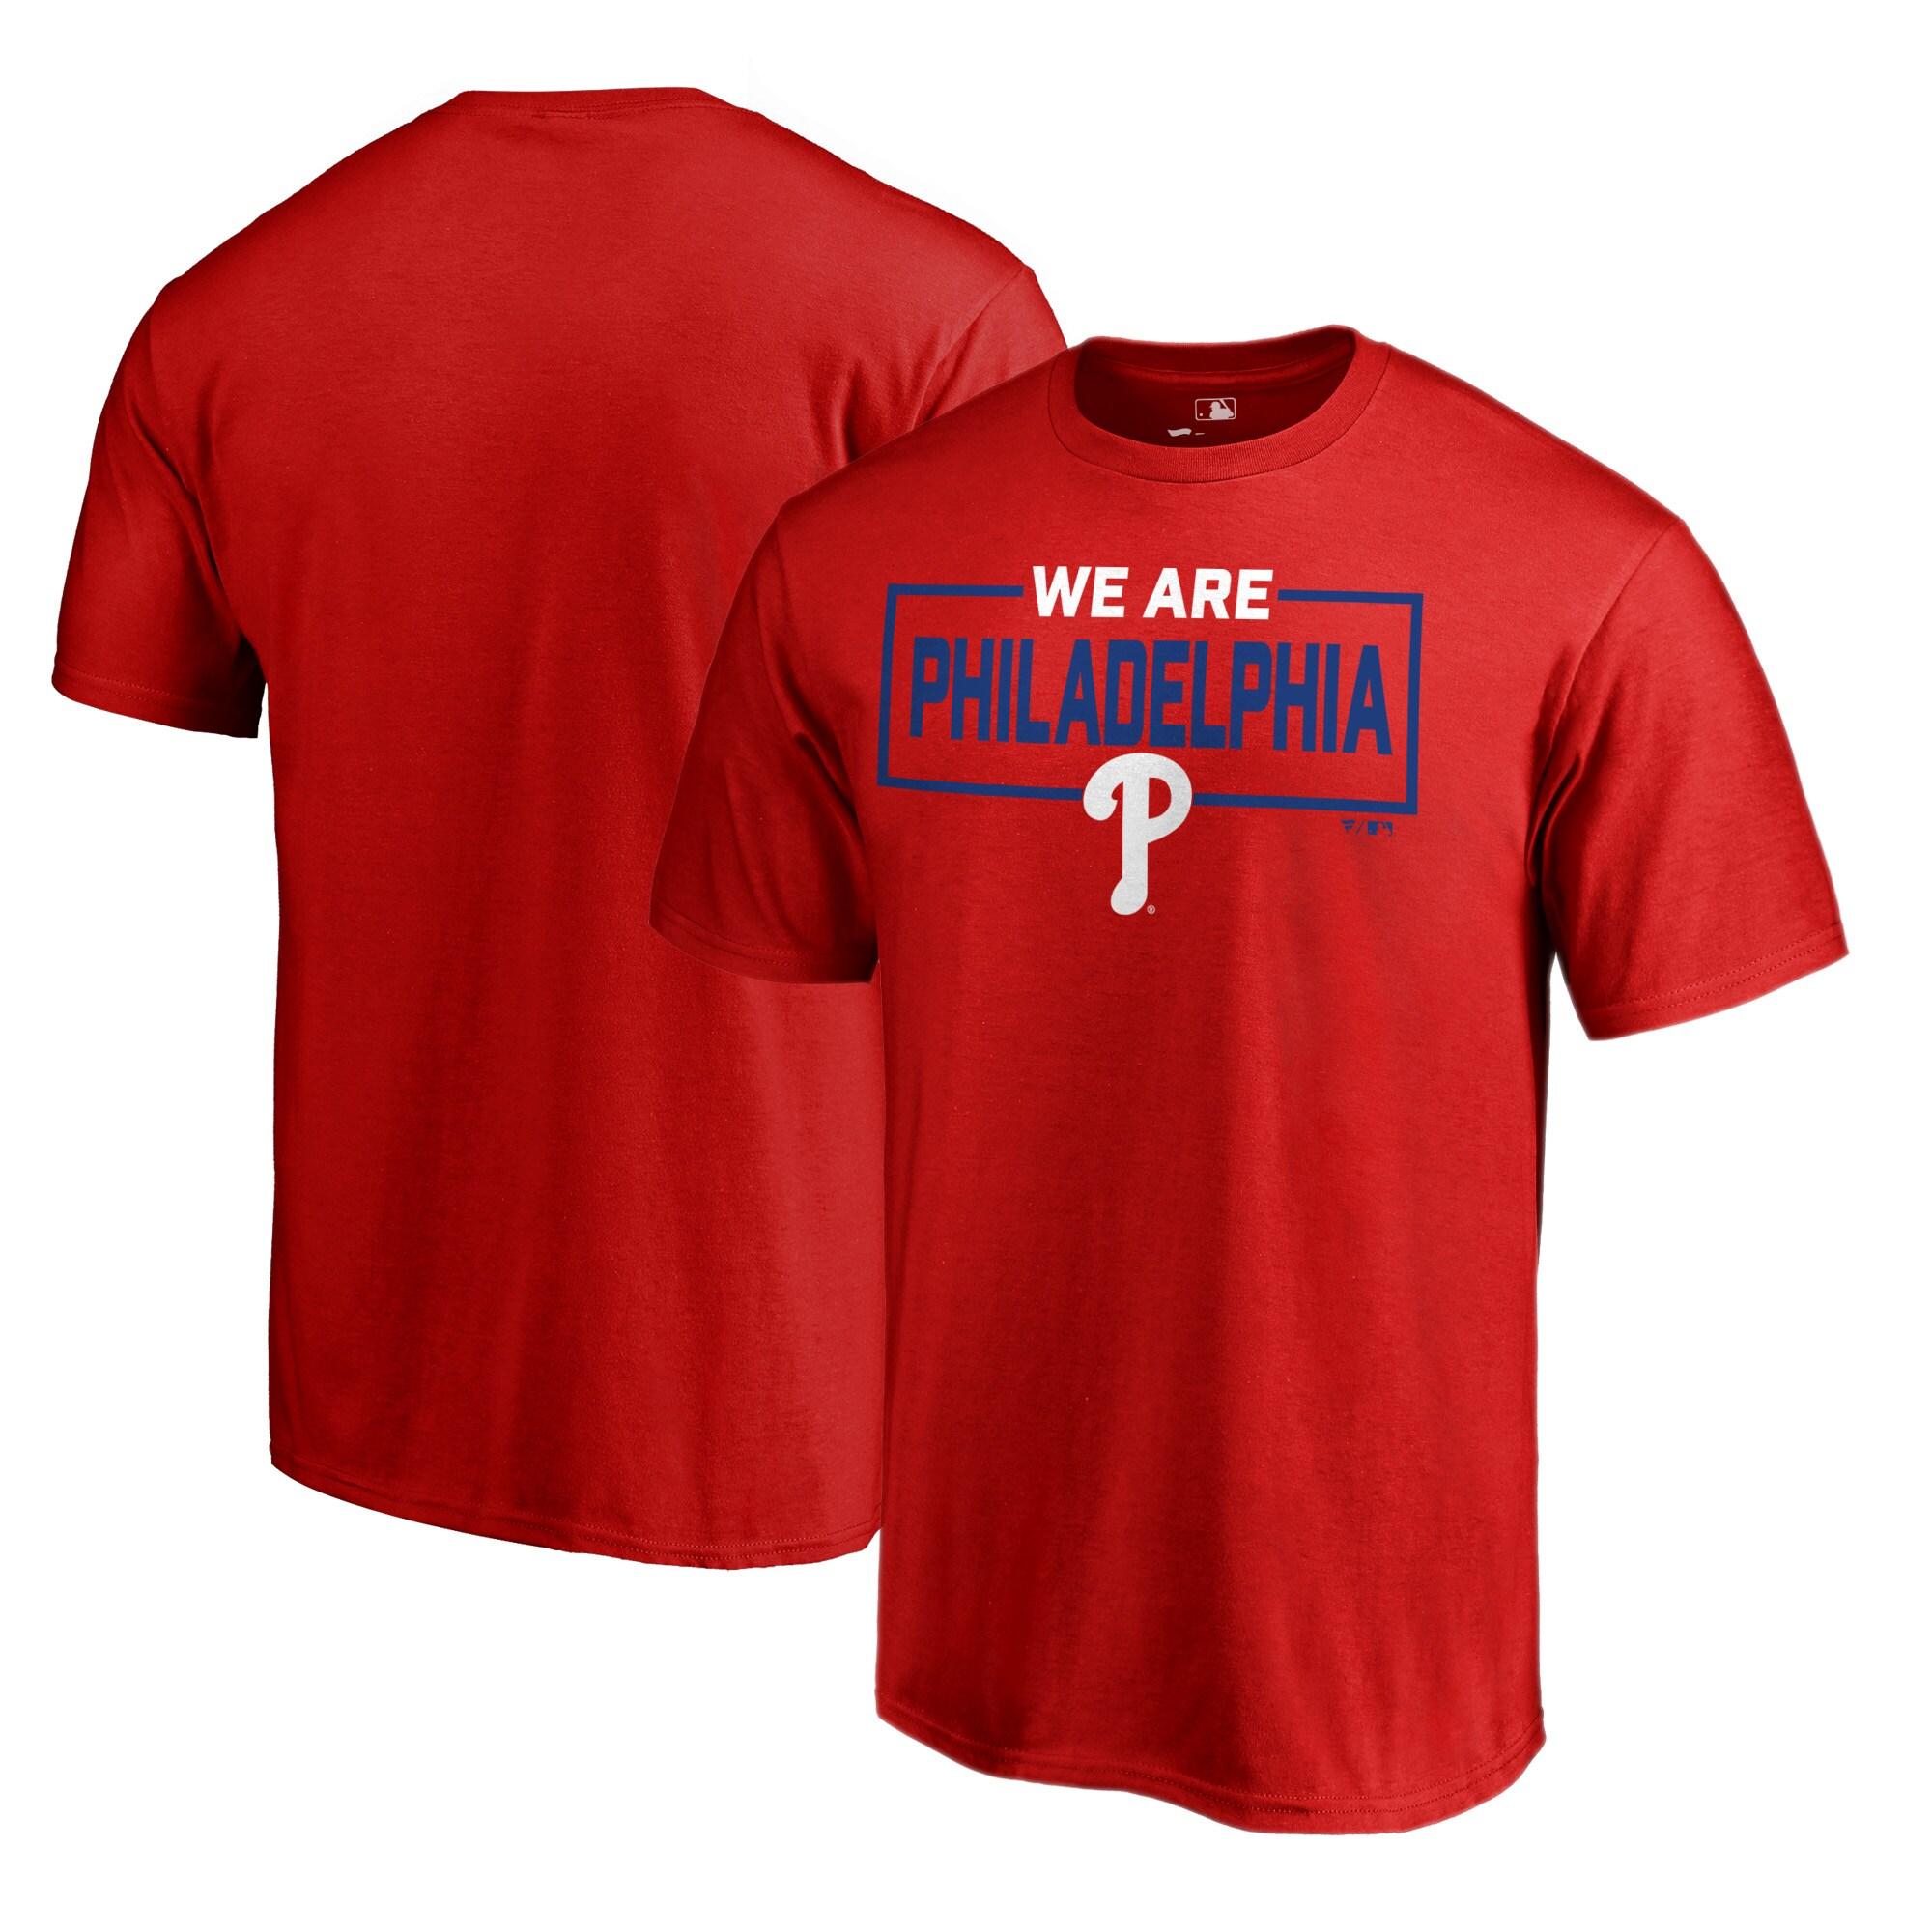 Philadelphia Phillies Fanatics Branded We Are Icon T-Shirt - Red